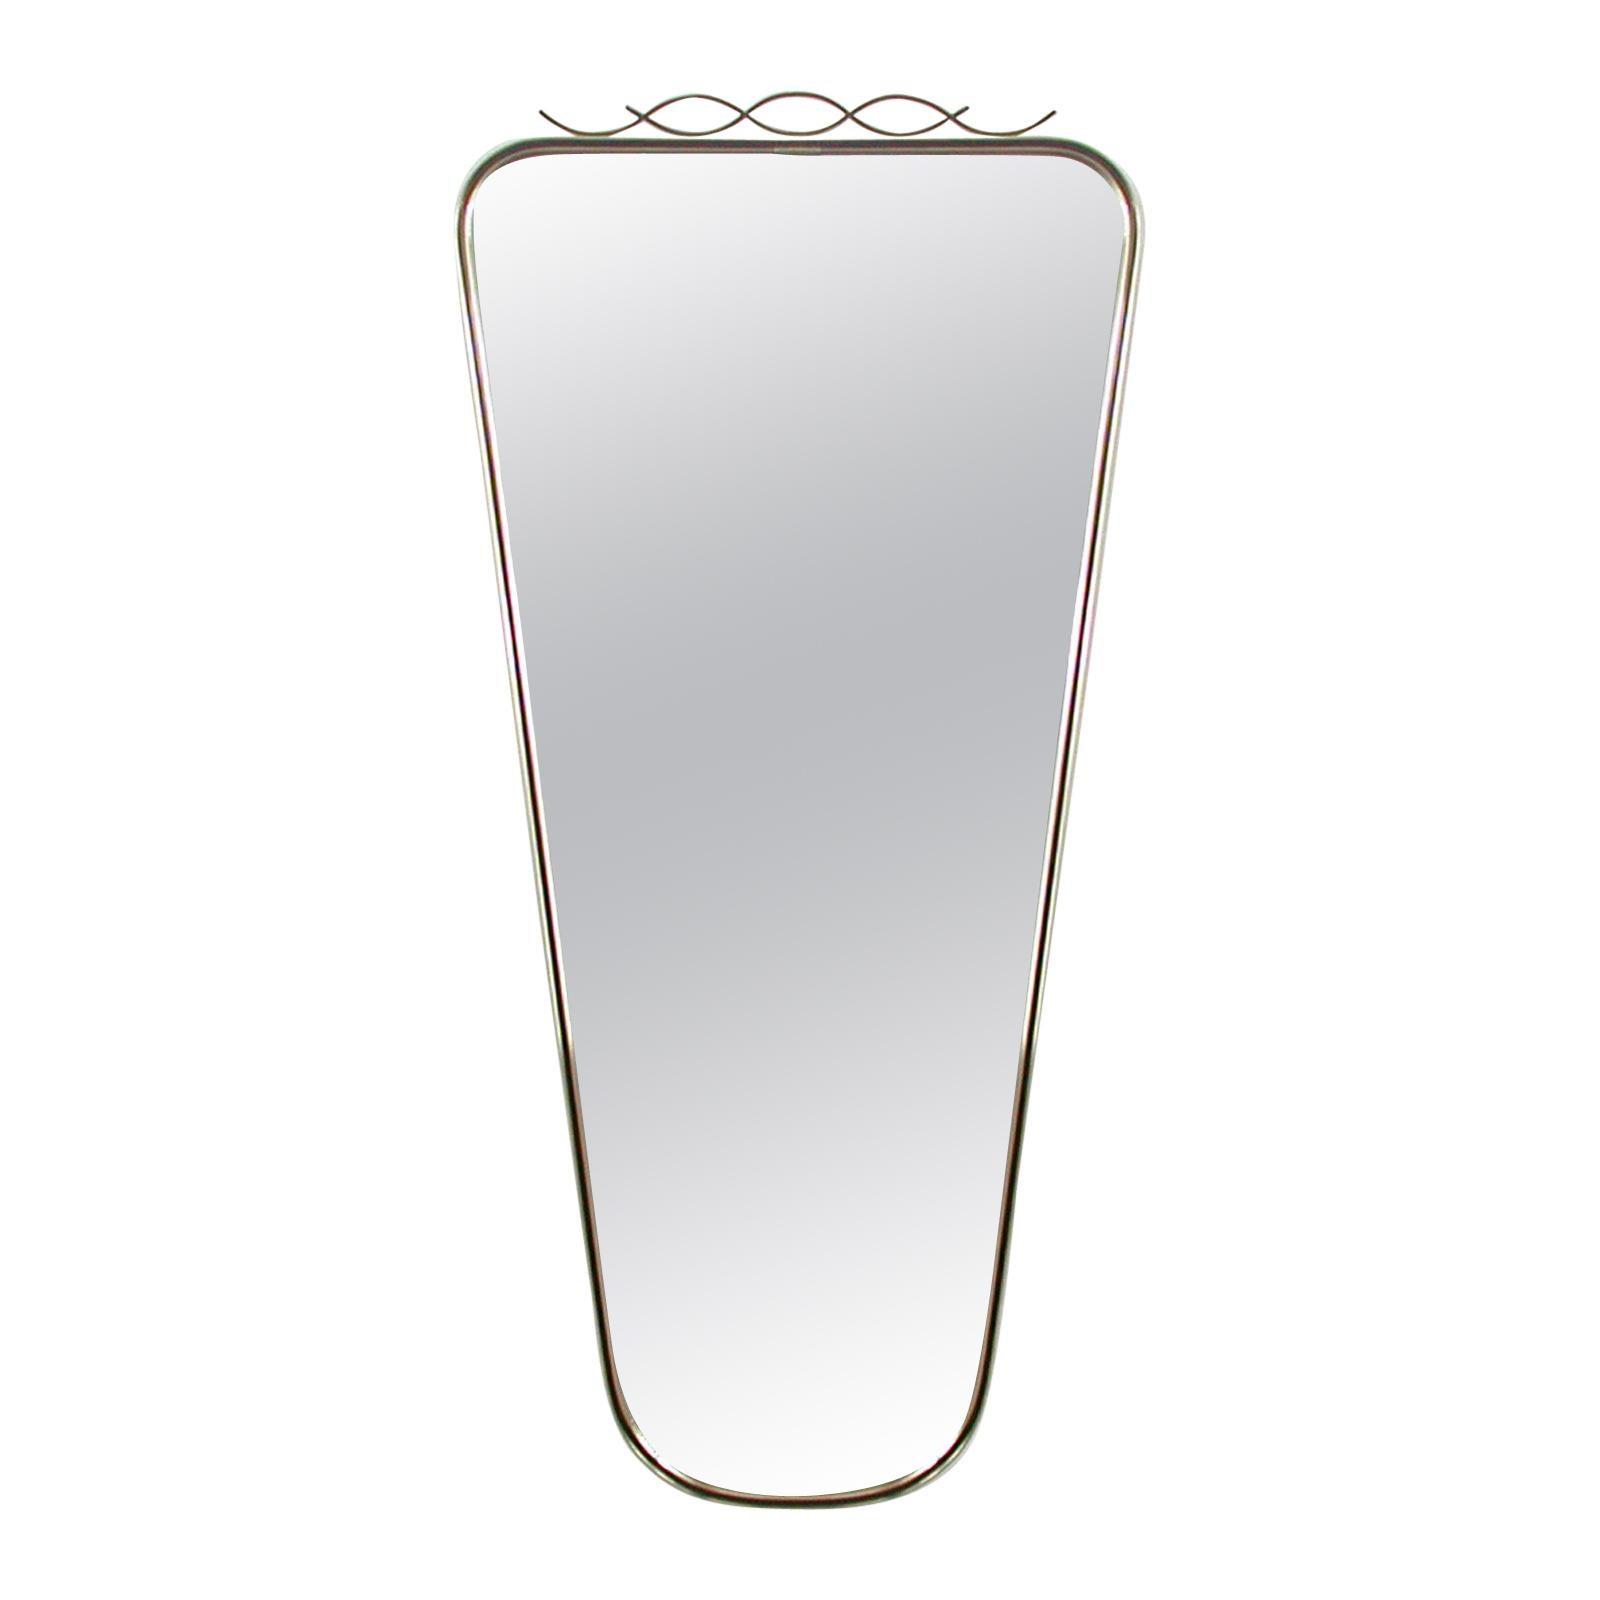 Midcentury Brass & Black Enamel Wall Mirror, 1950s